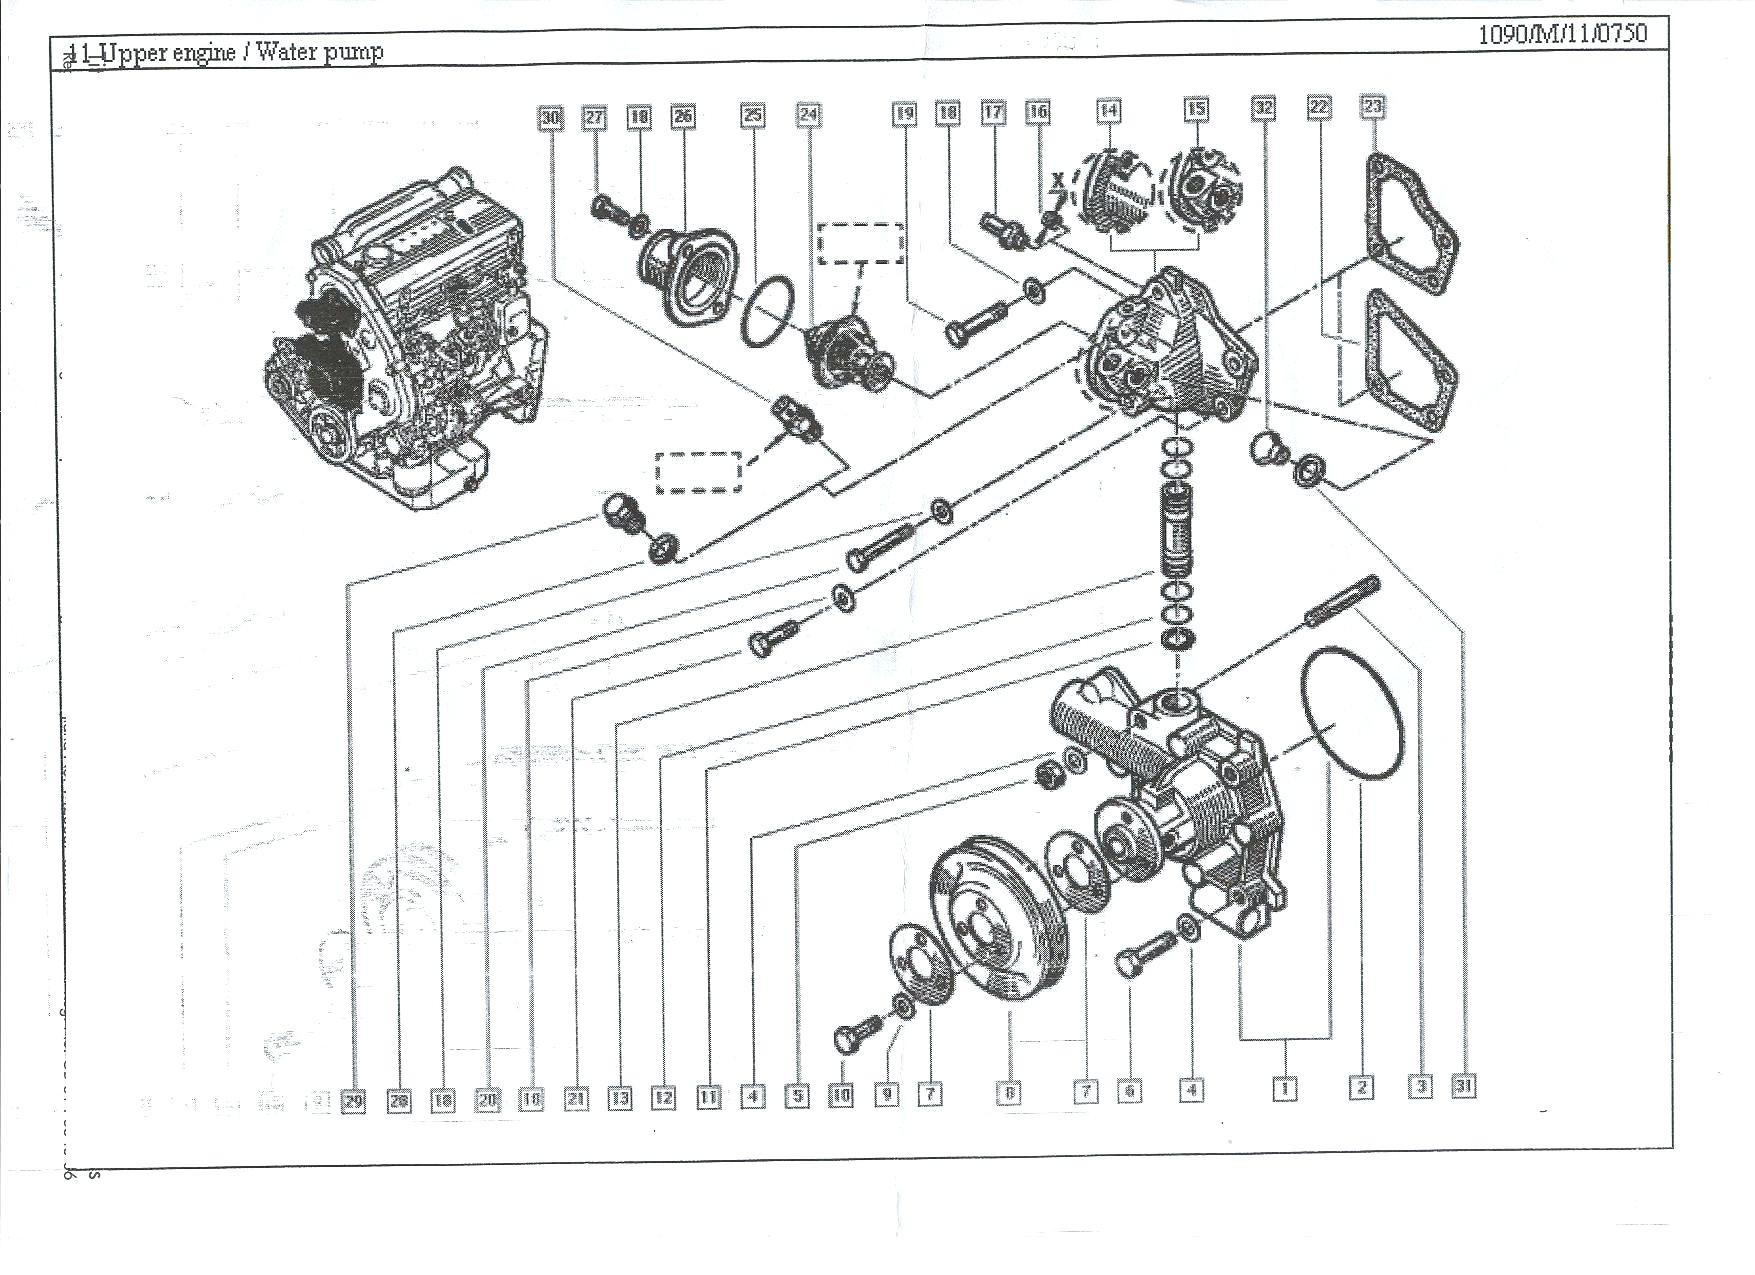 Renault Master Engine Diagram Renault Master Engine Diagram Renault Engine Diagrams Clio Diagram Of Renault Master Engine Diagram